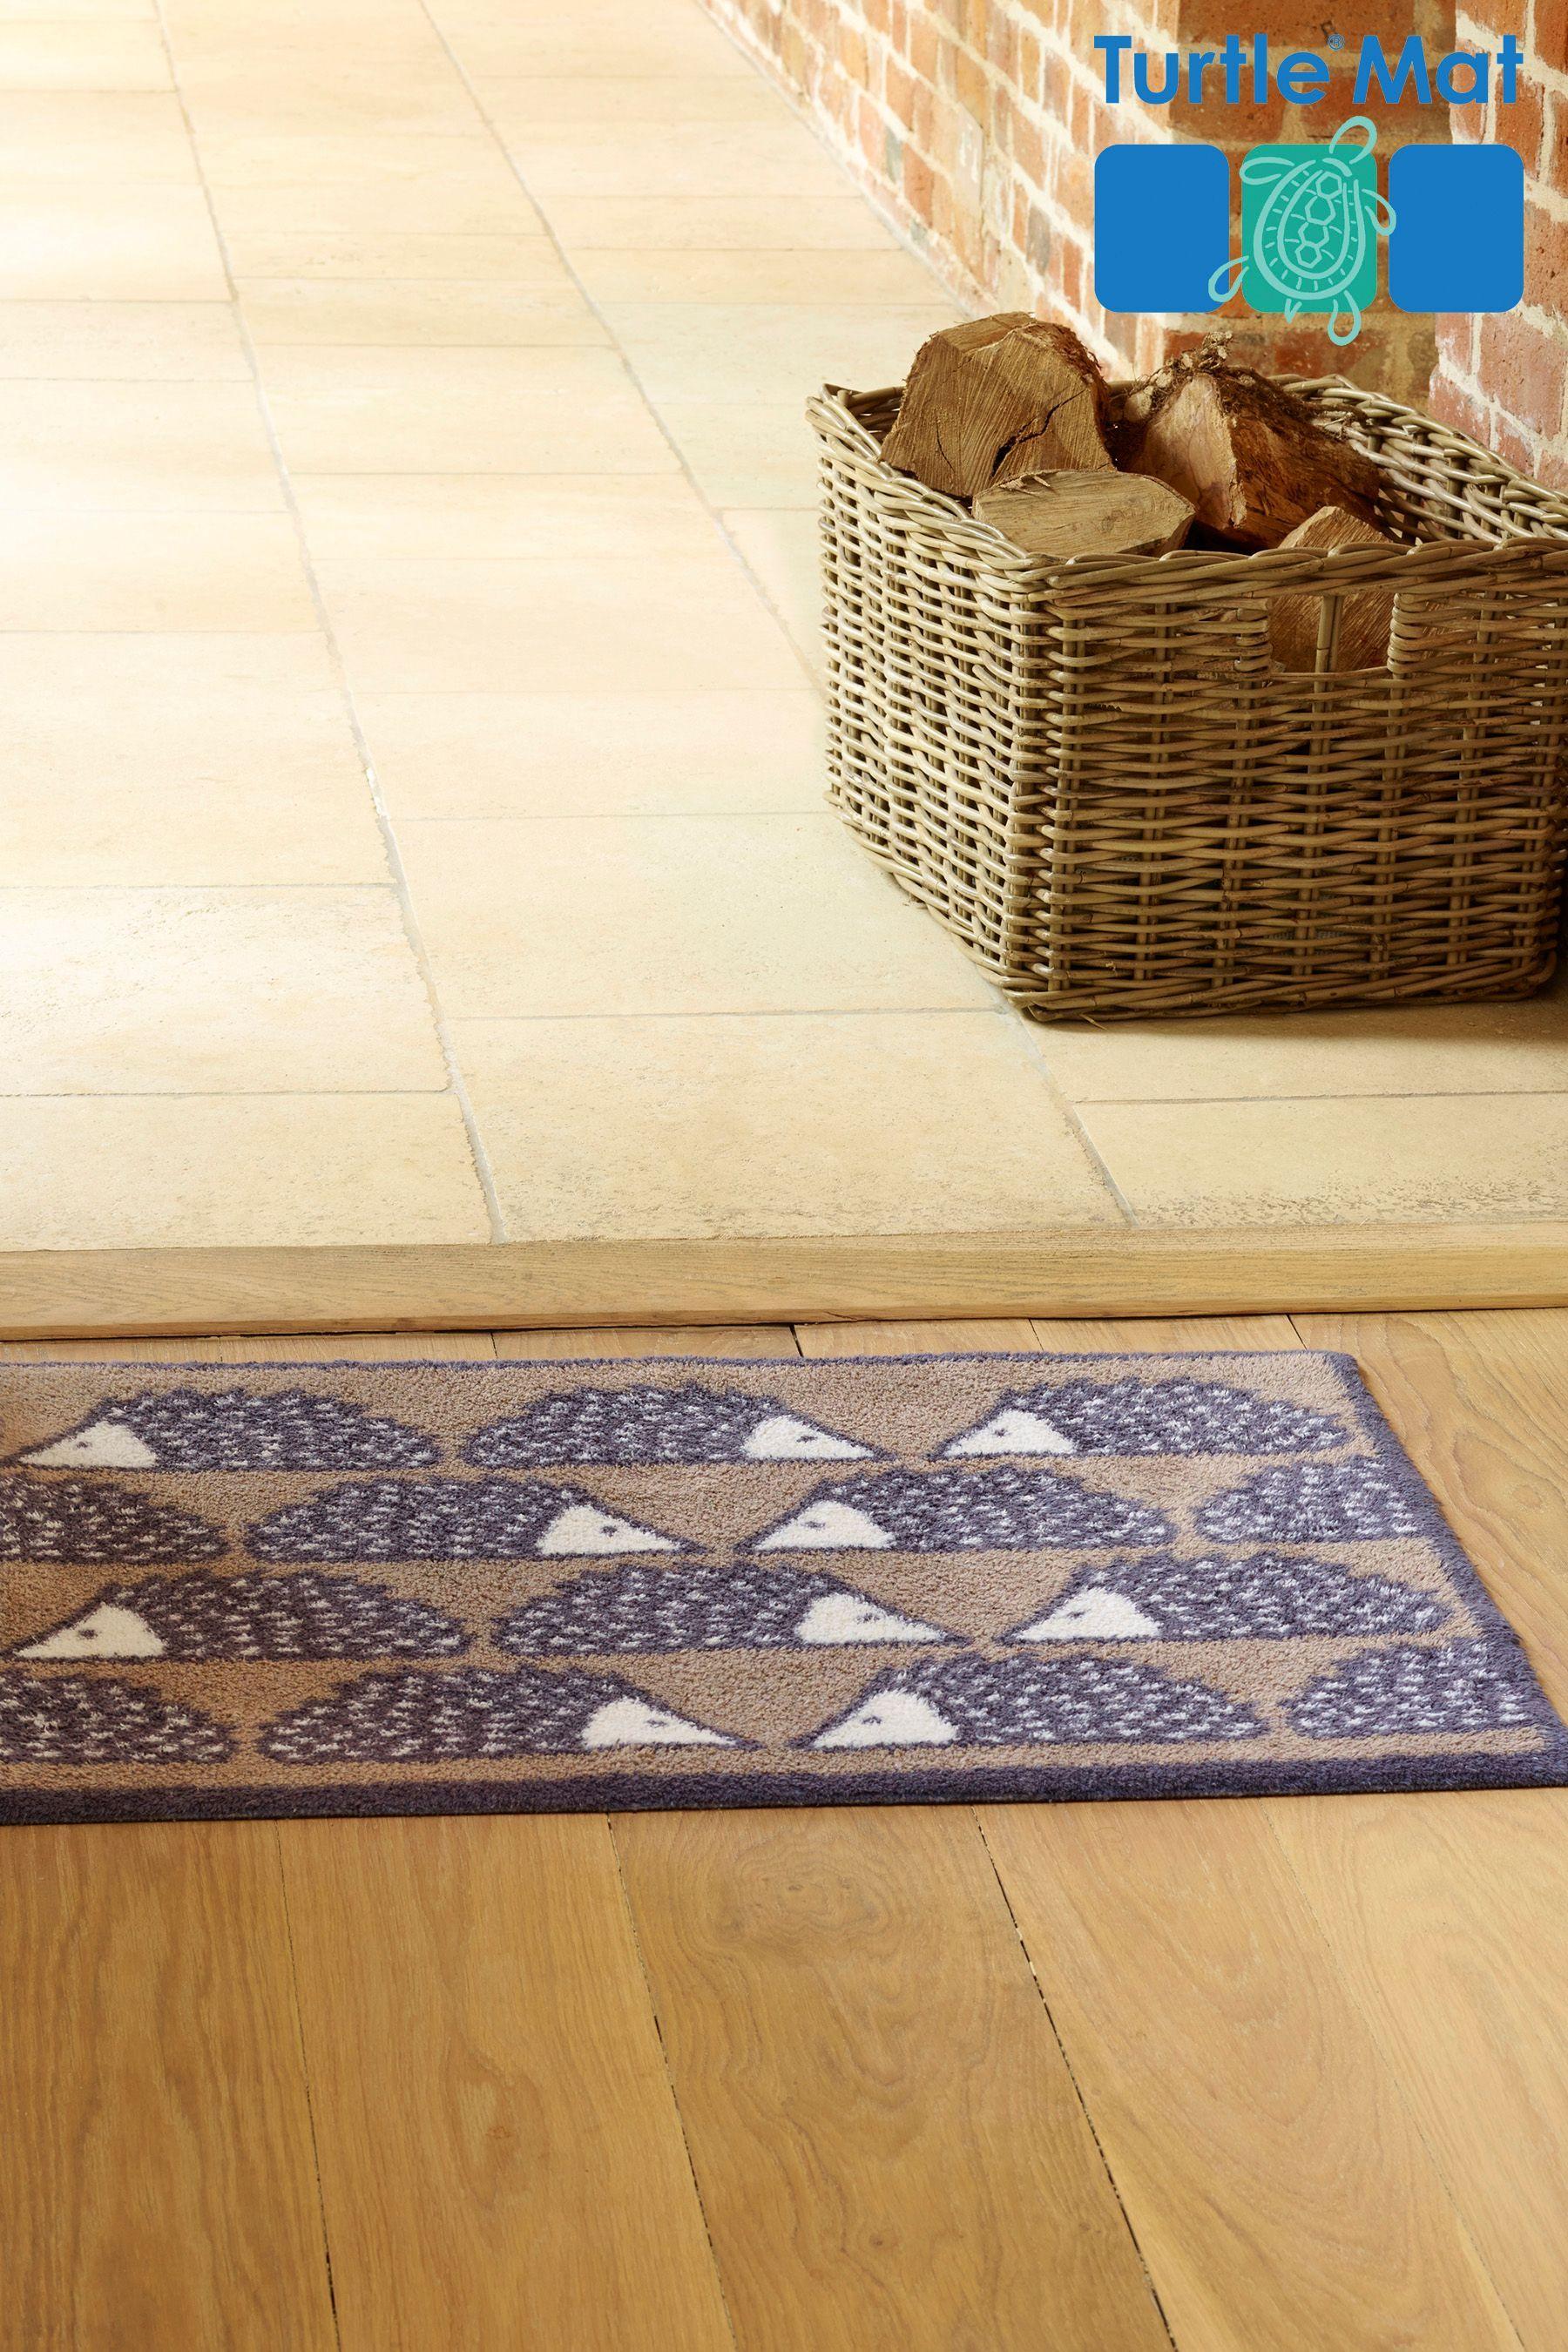 Turtle Mats Dirt Trapper Spike Doormat Grey Kids Rugs Carpet Flooring Carpet